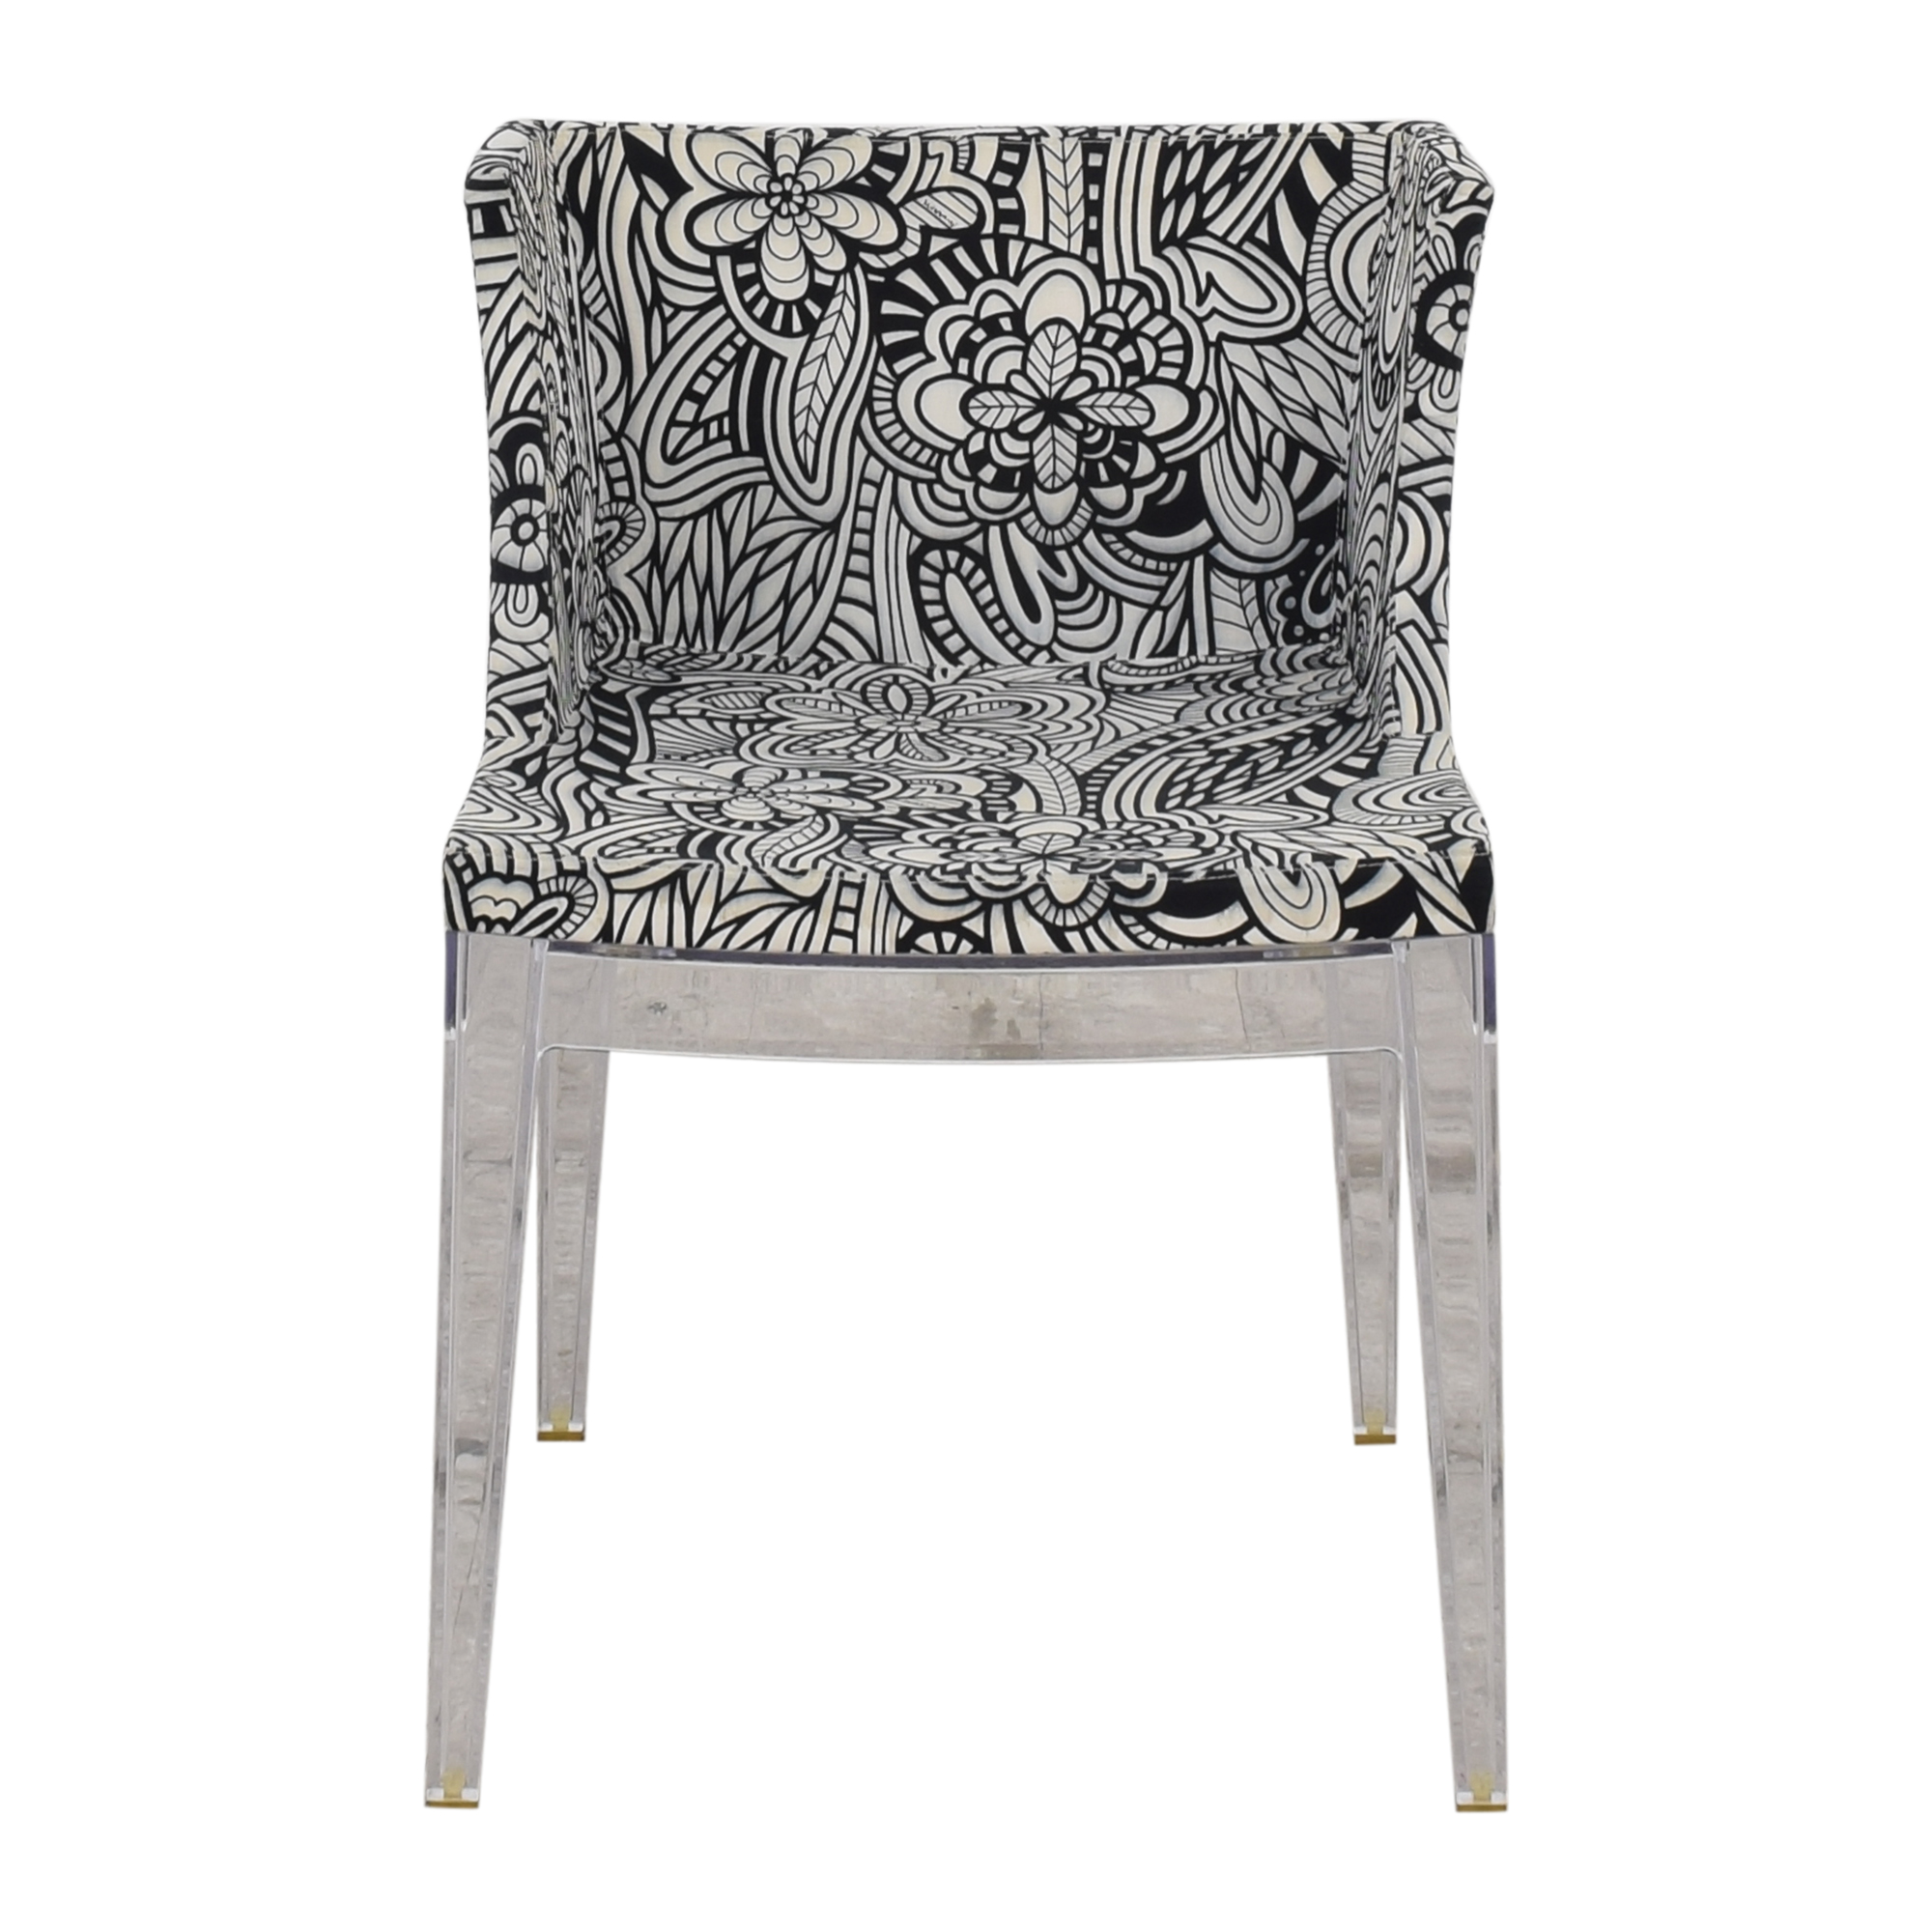 Kartell Kartell Mademoiselle Chair Chairs